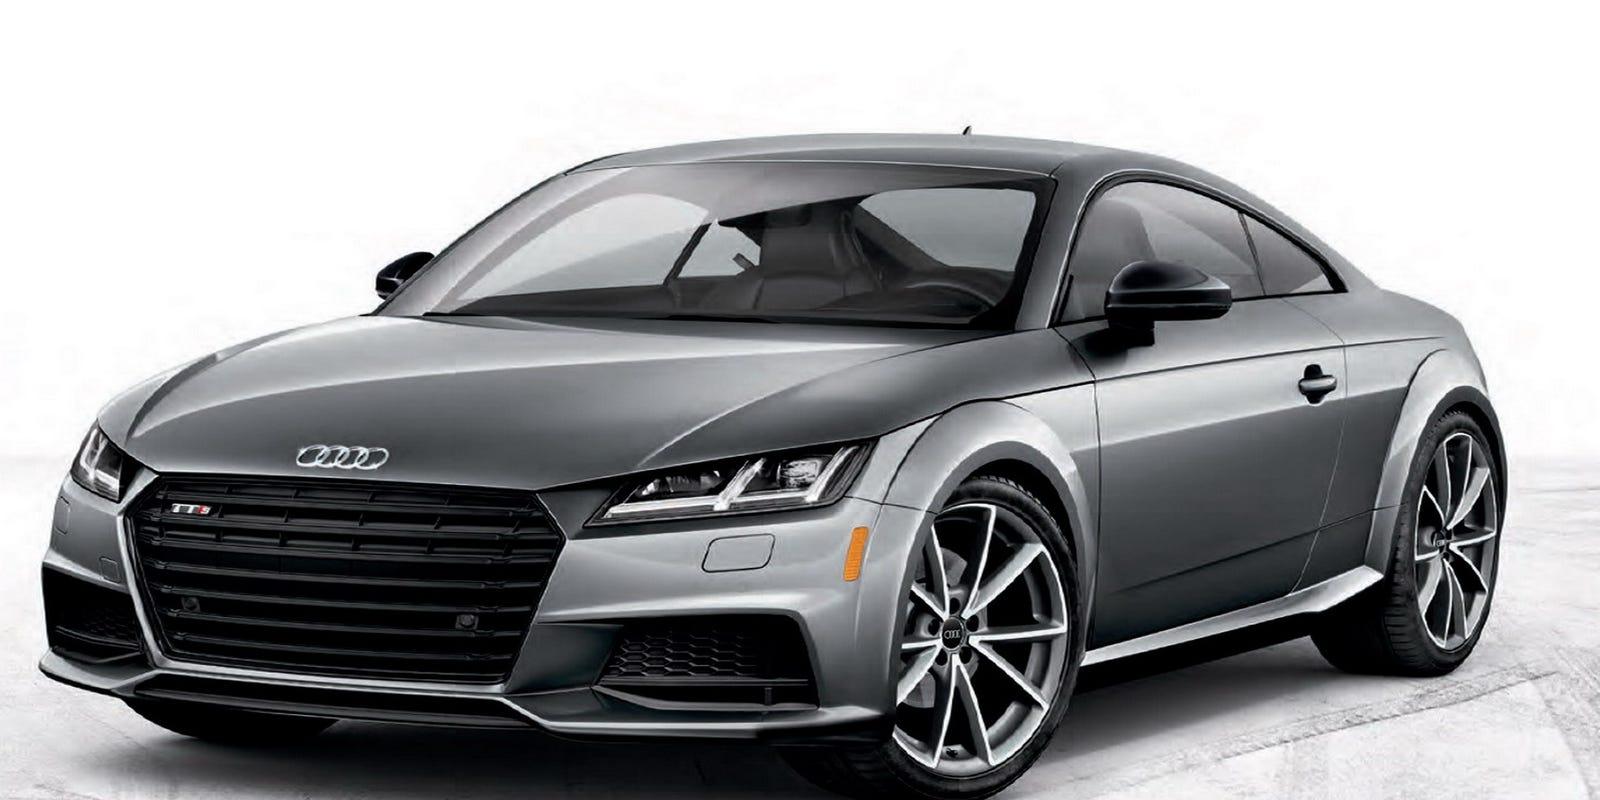 2017 Audi TT coupe defines sports coupe segment